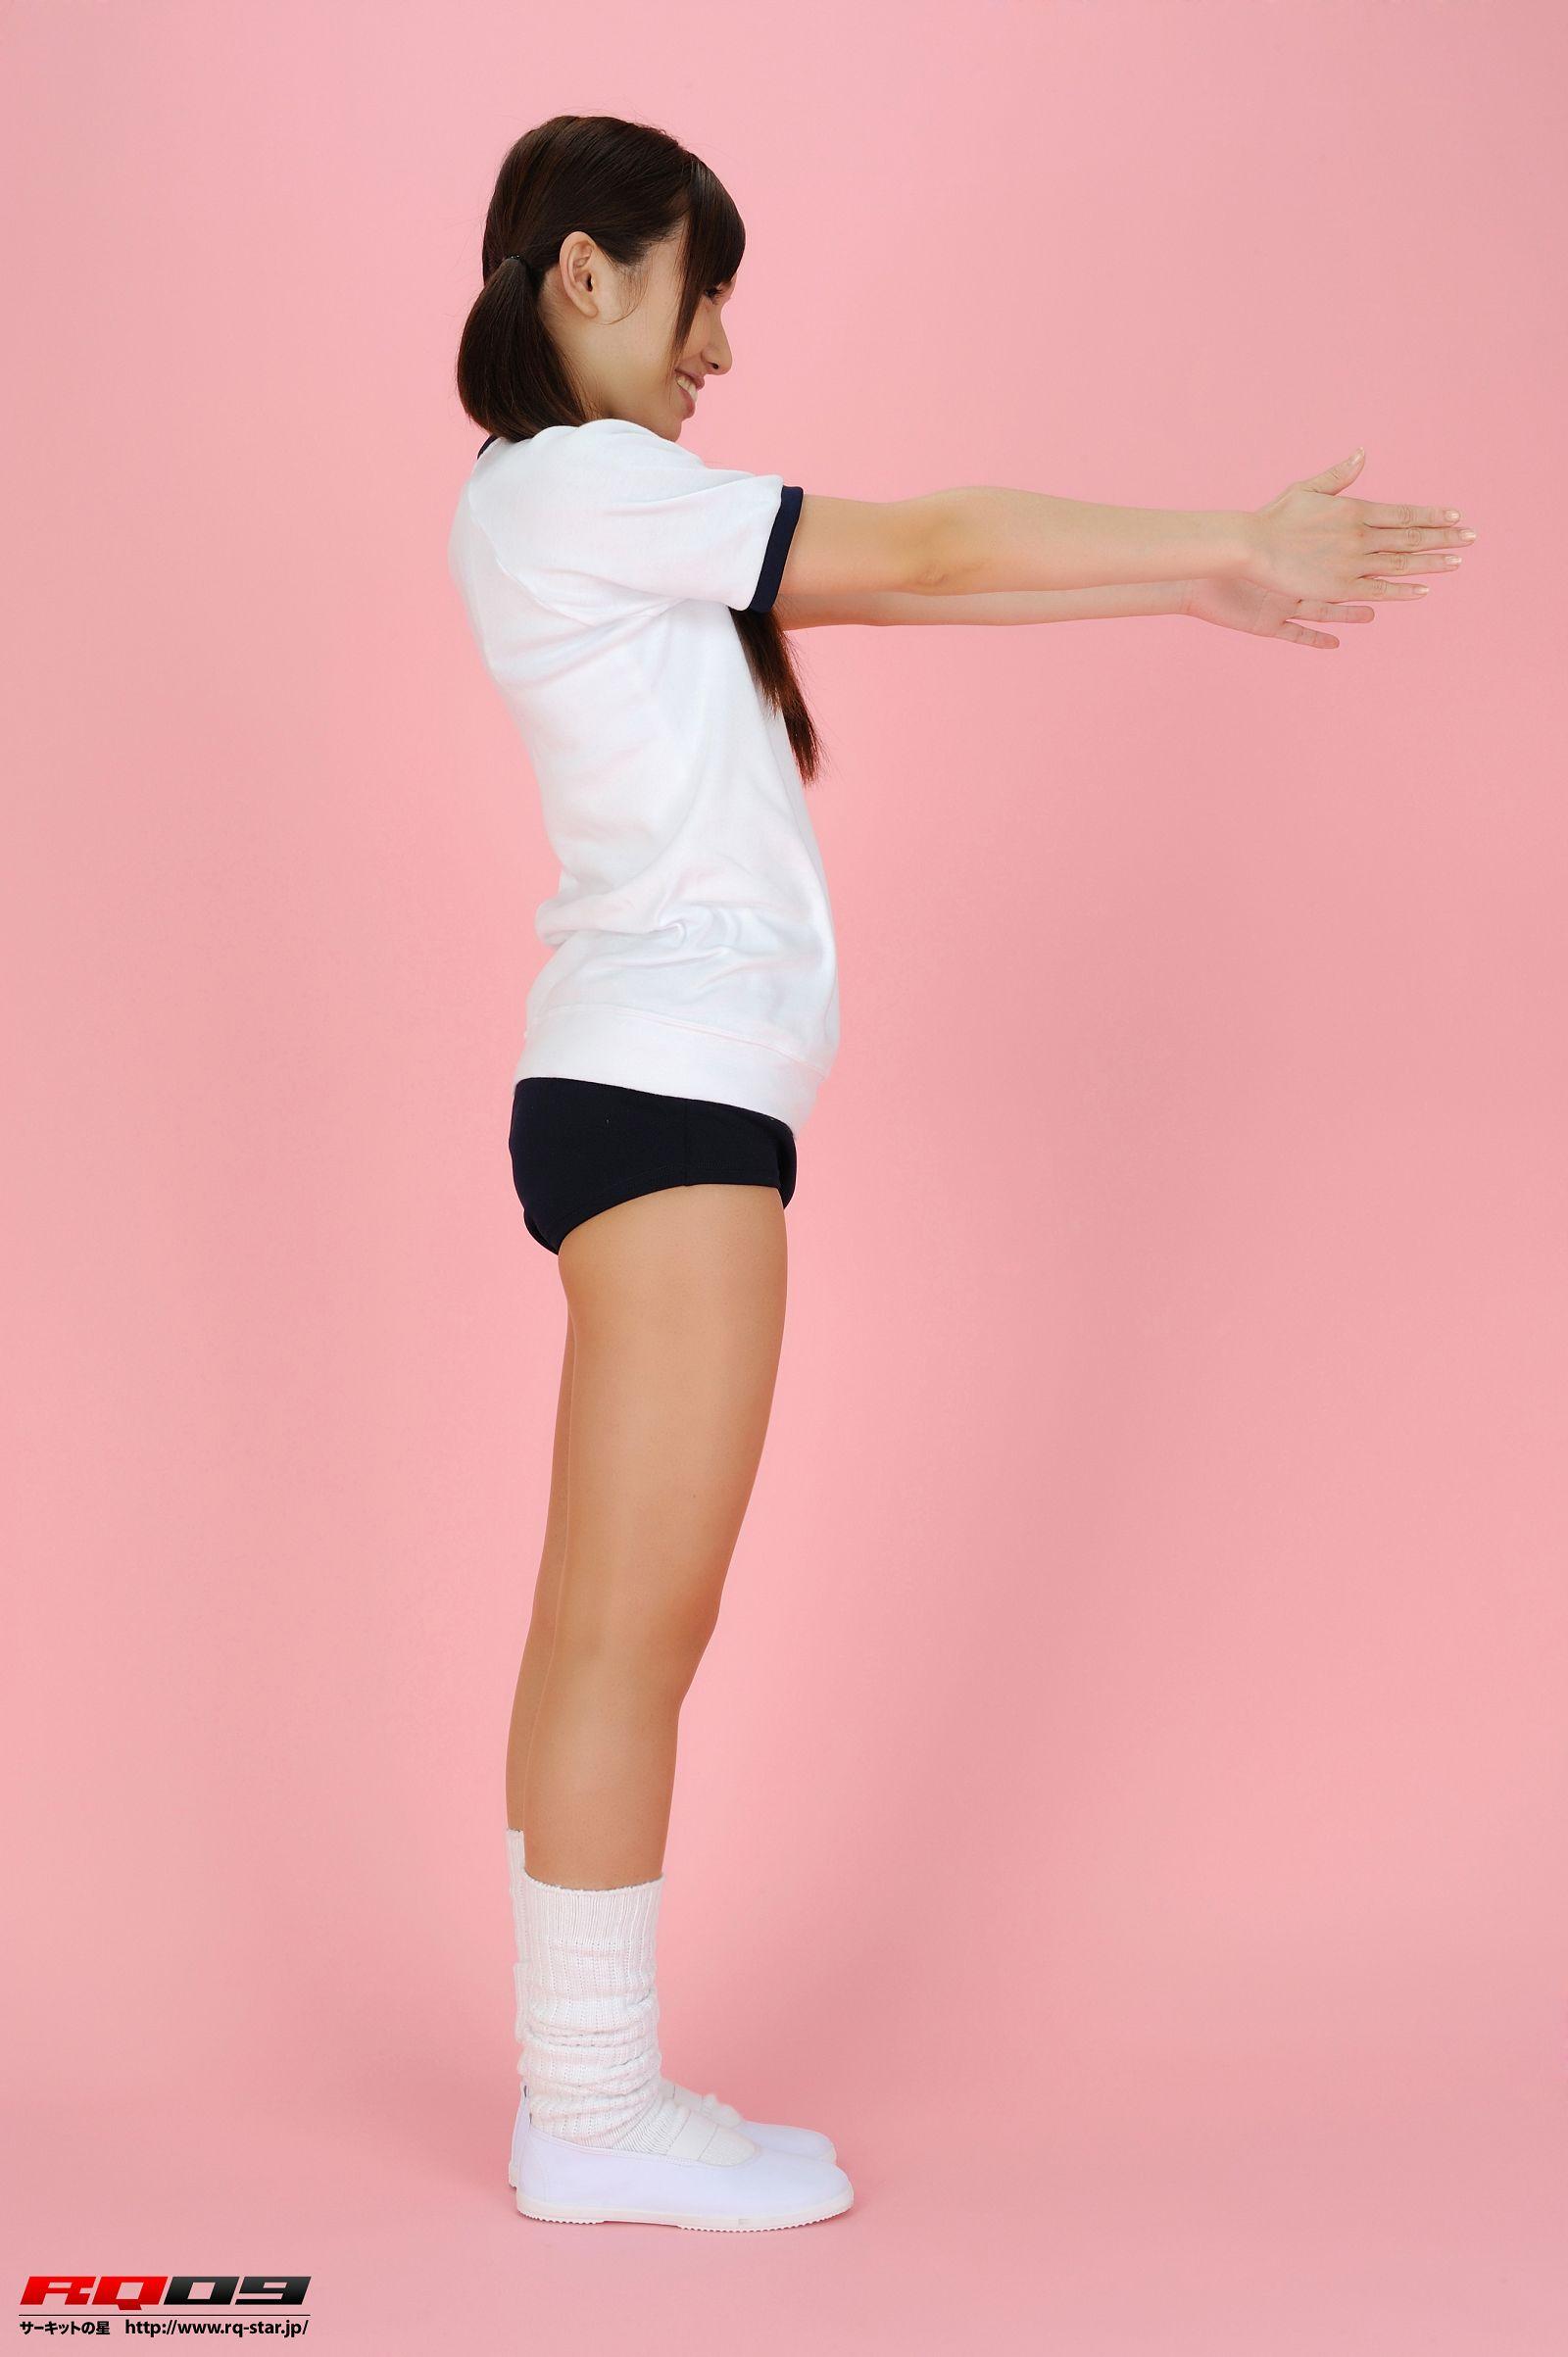 [RQ STAR美女] NO.0227 Asami Nakata 中田あさみ Bloomers Gymwear[70P] RQ STAR 第3张